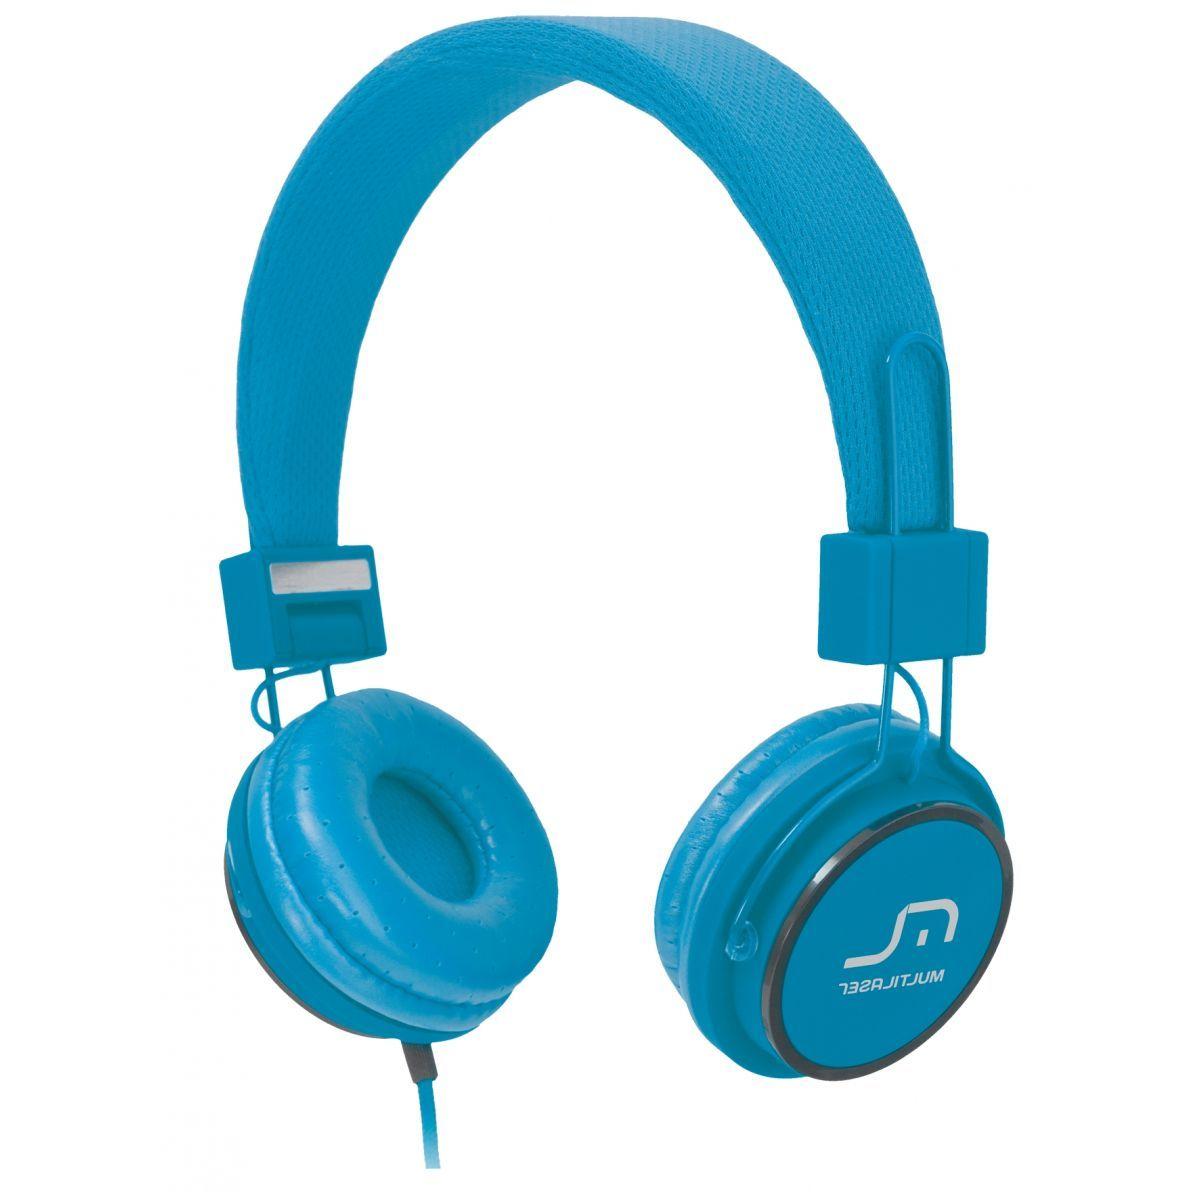 Fone de Ouvido com Microfone Headfun - Azul